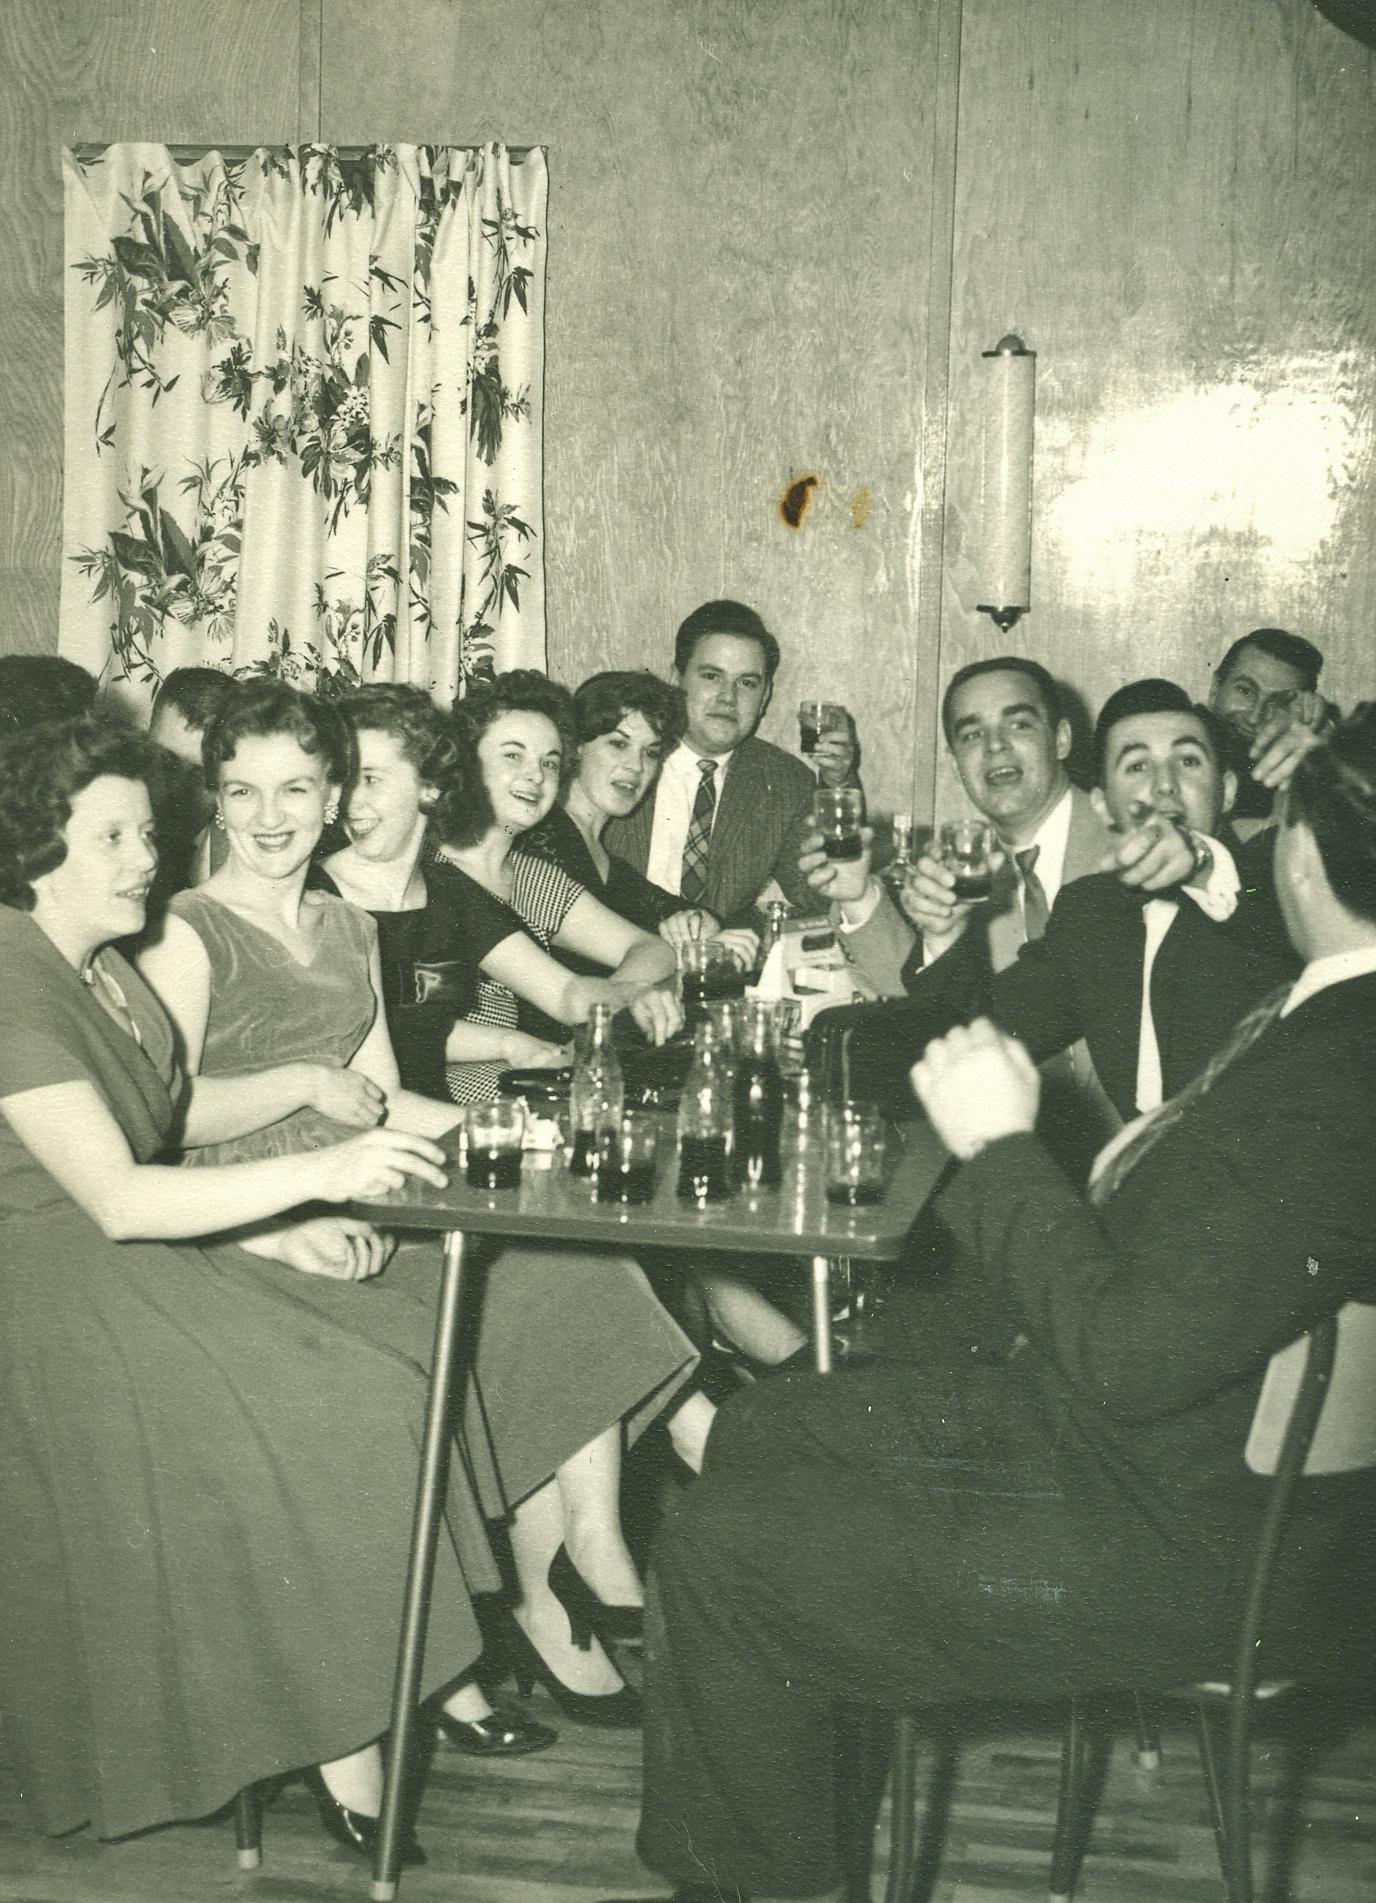 Bethlehem Steel Party, Helen & Fred Stewart, Keitha & Tom Paranuik, Marilyn & Buck Mantle